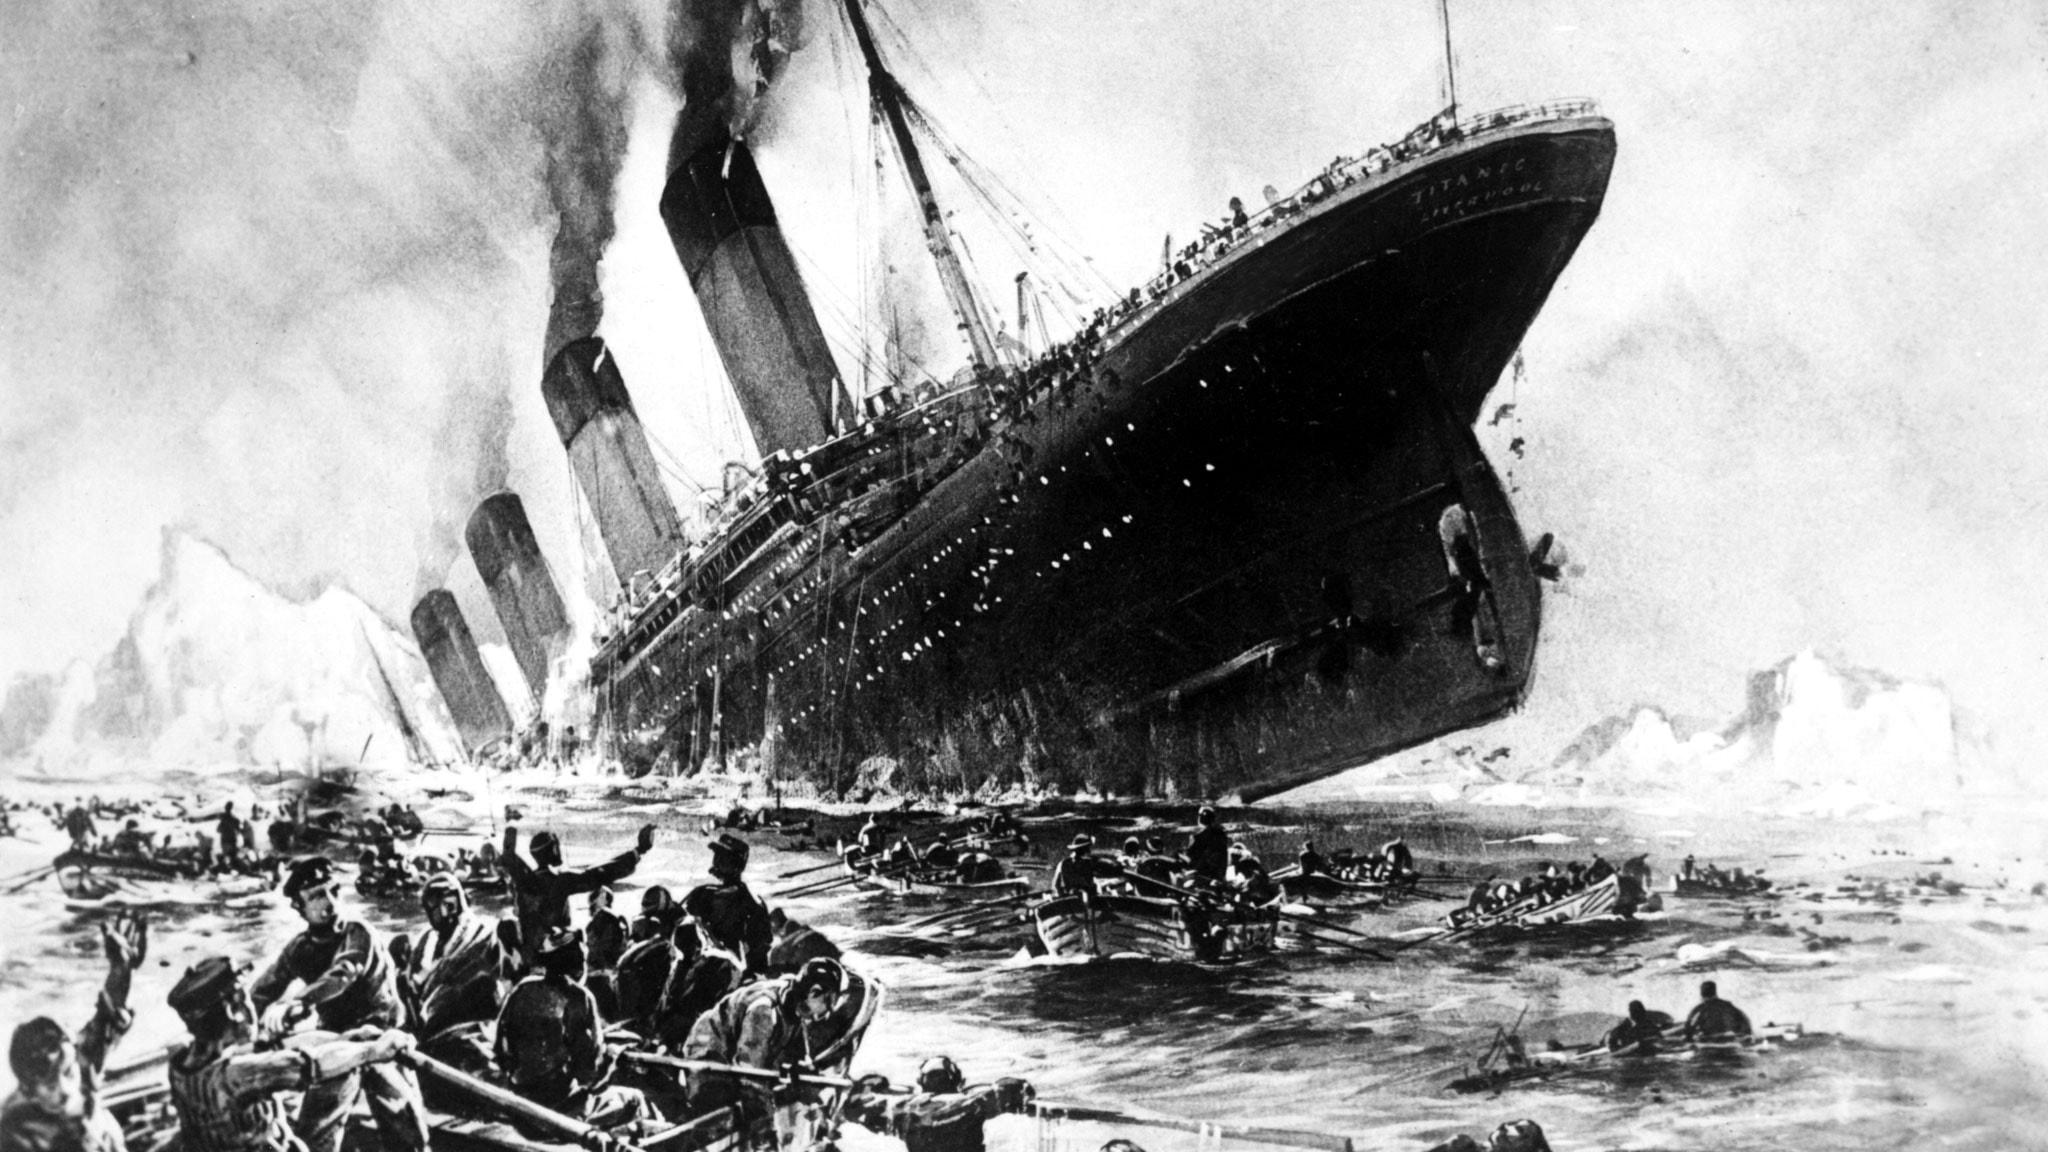 Hon överlevde Titanic